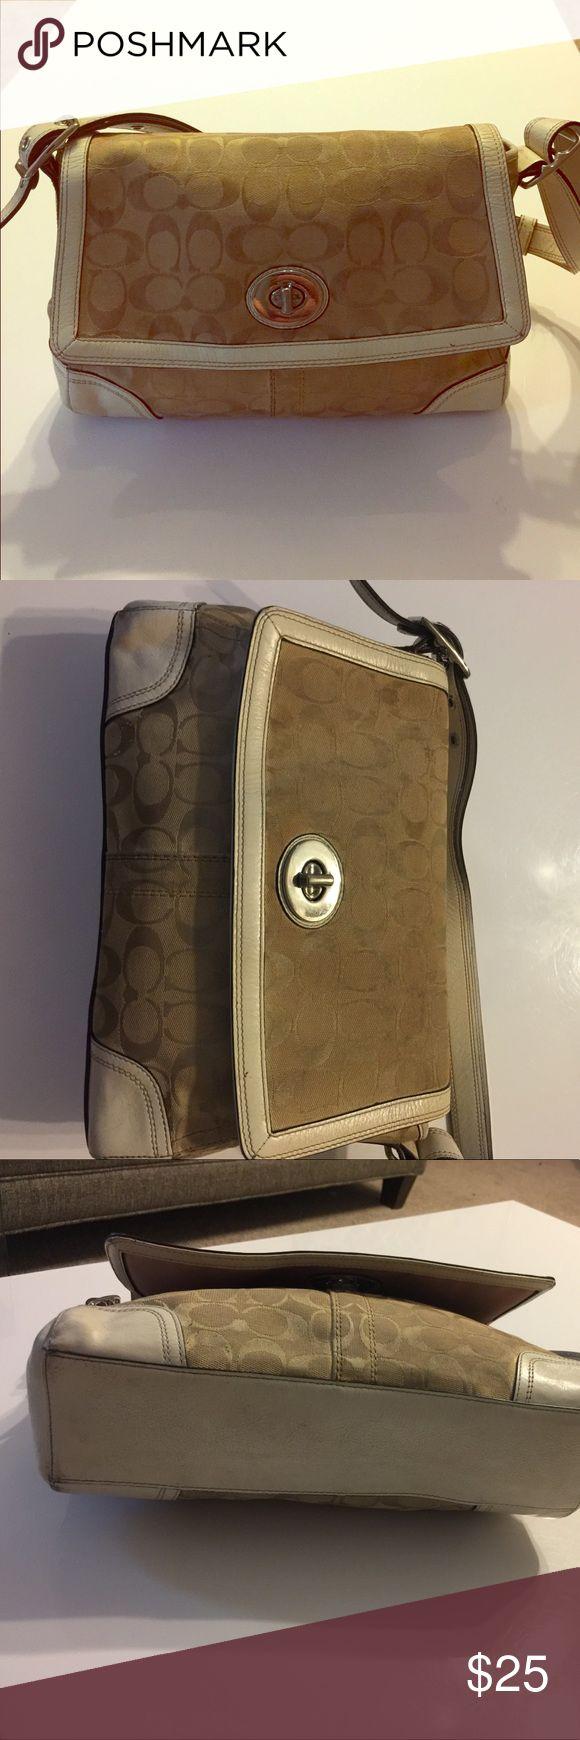 Coach purse Coach purse. Needs to be cleaned. Coach Bags